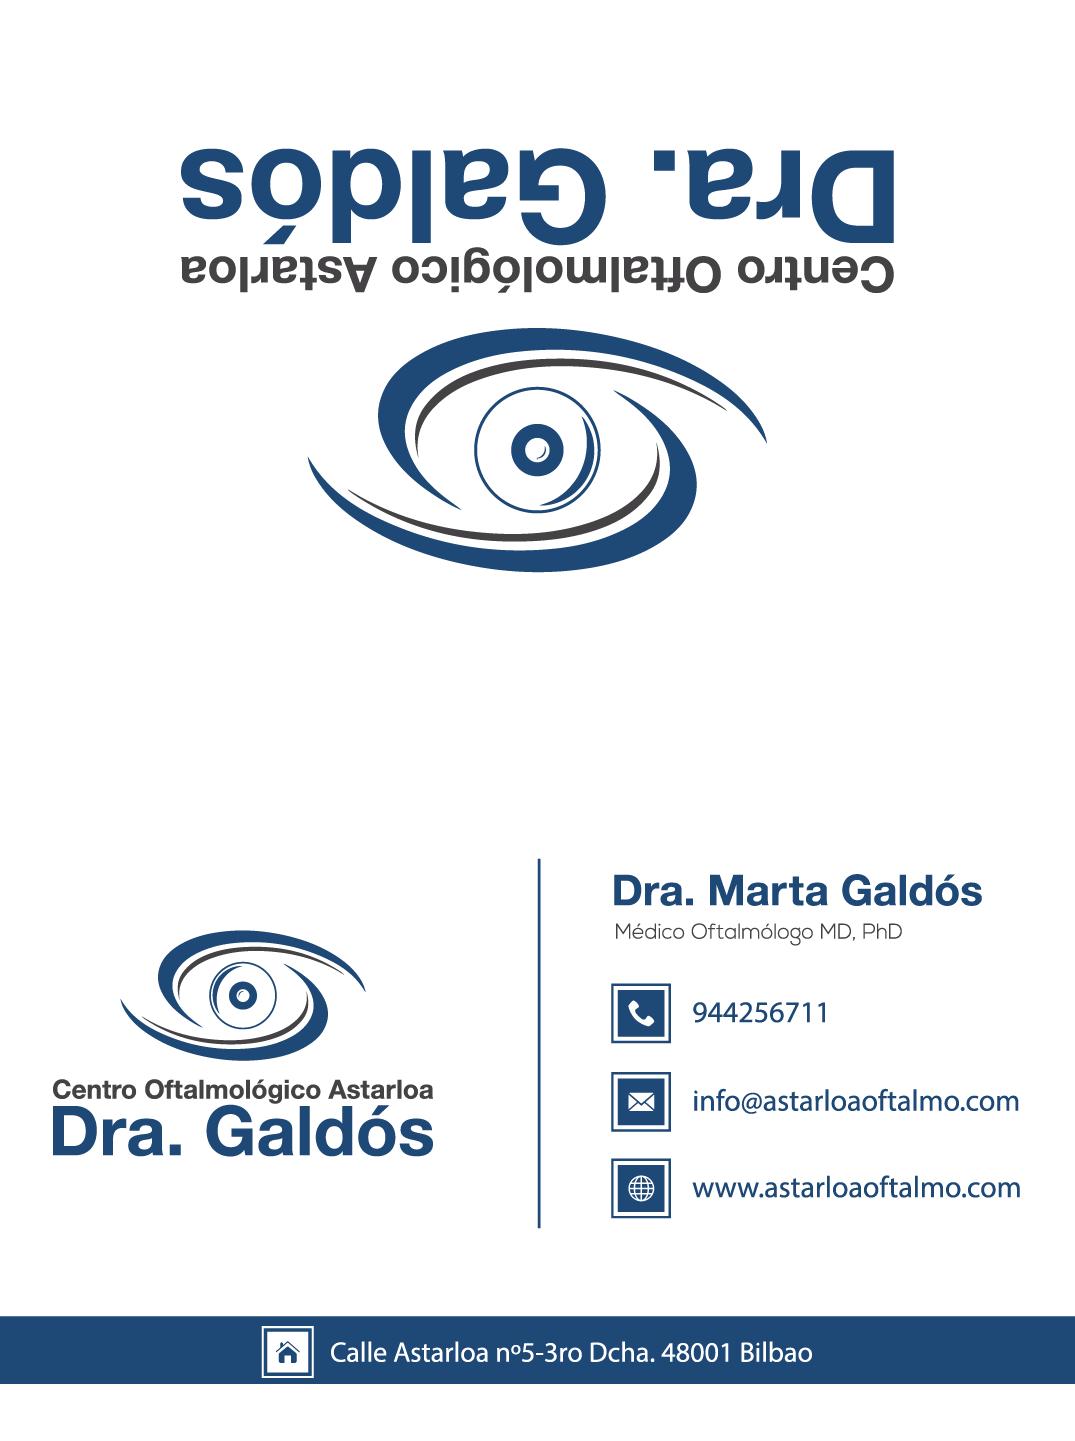 Paperwork and business cards for Centro Oftalmológico Astarloa